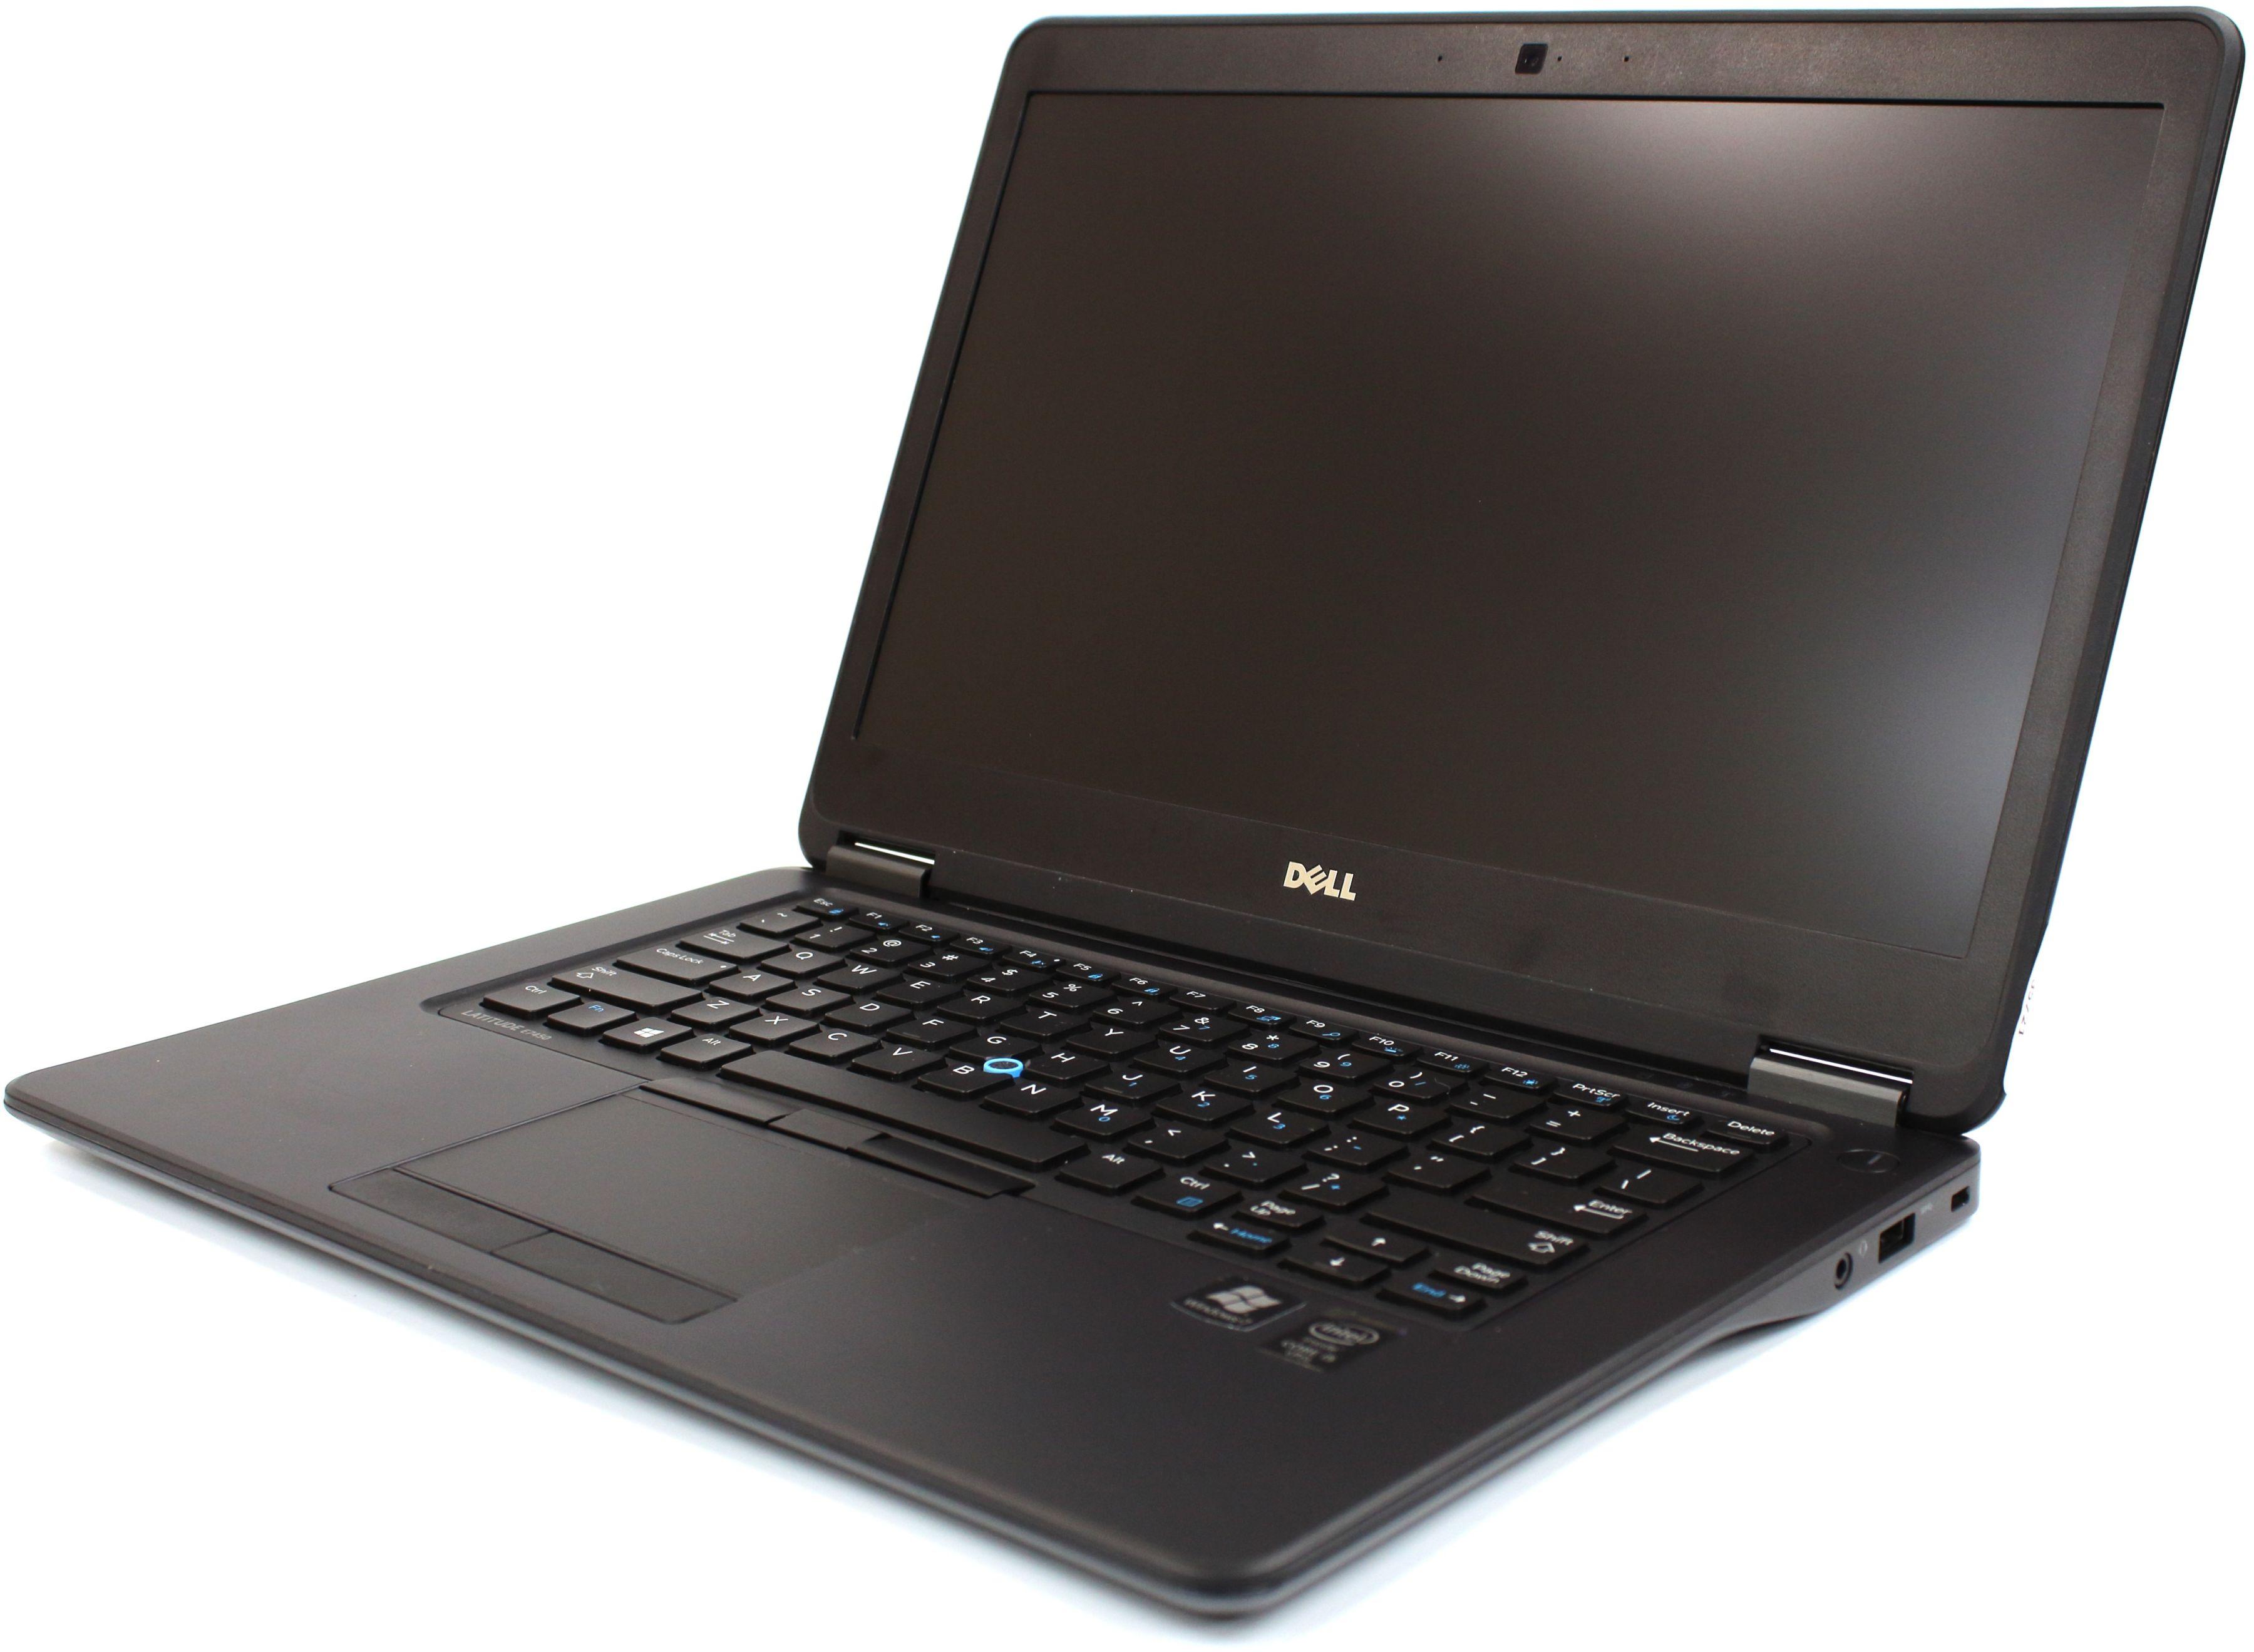 UltraBook DELL Latitude E7450 FHD i5-5300U 2.90GHz 8GB 256GB SSD HDMI Kamera Windows 7 Pro (Klasa A)